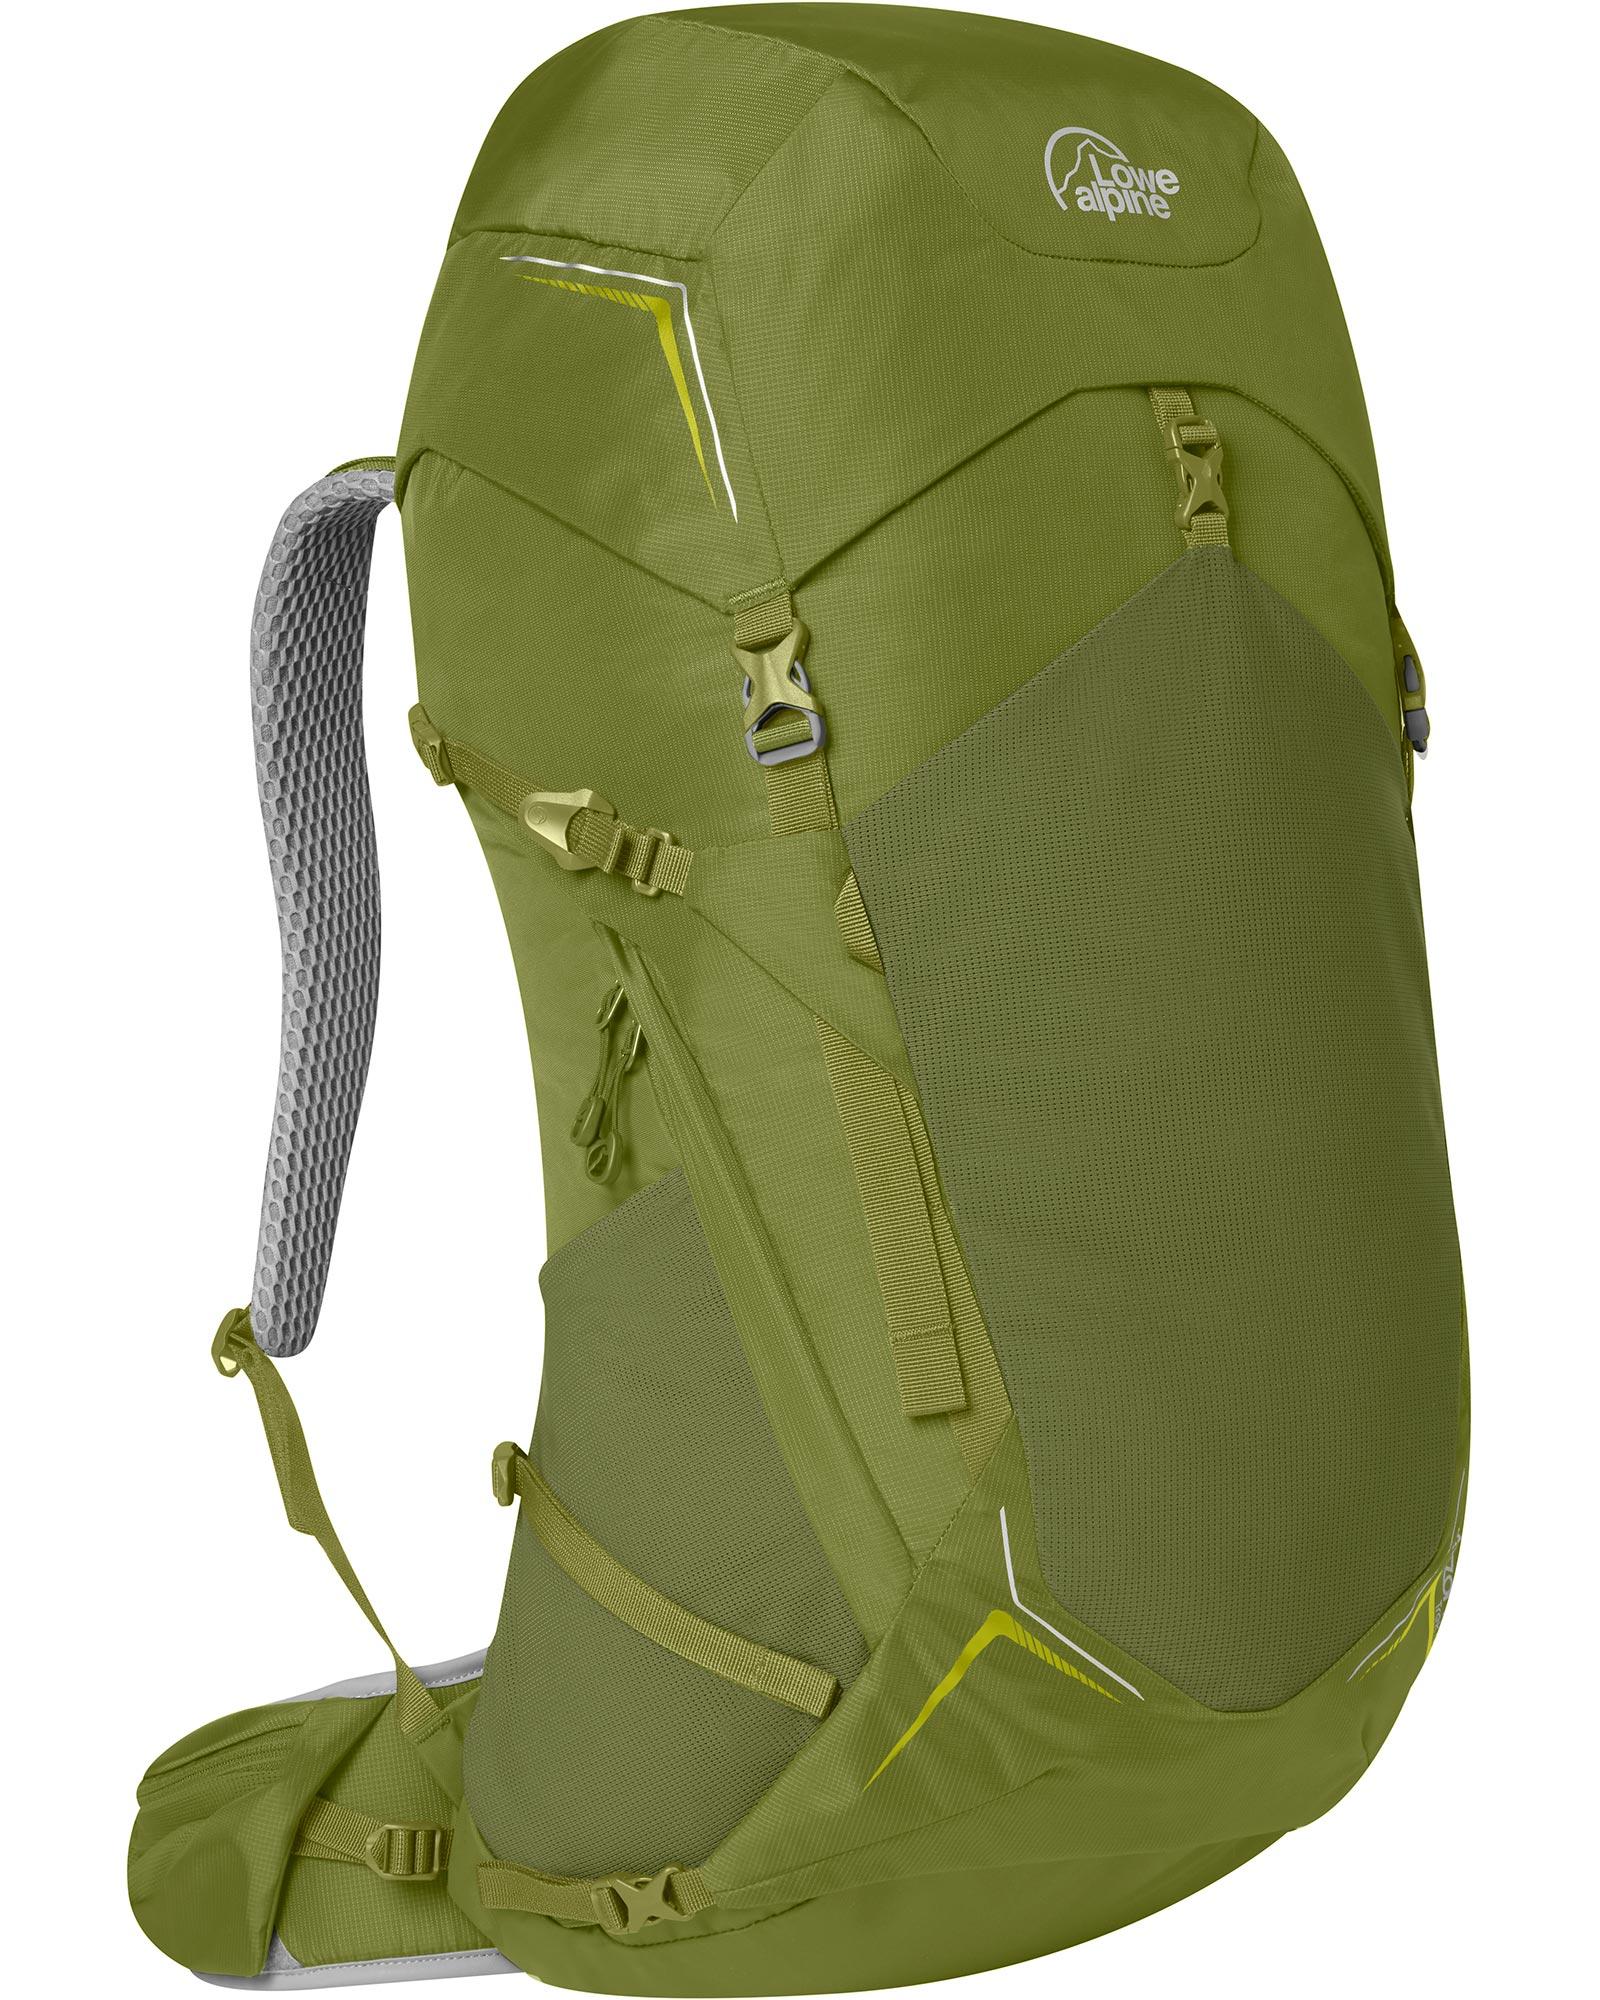 K2 Mens Recon 120 Mv Gw Ski Boots 2020 / 2021